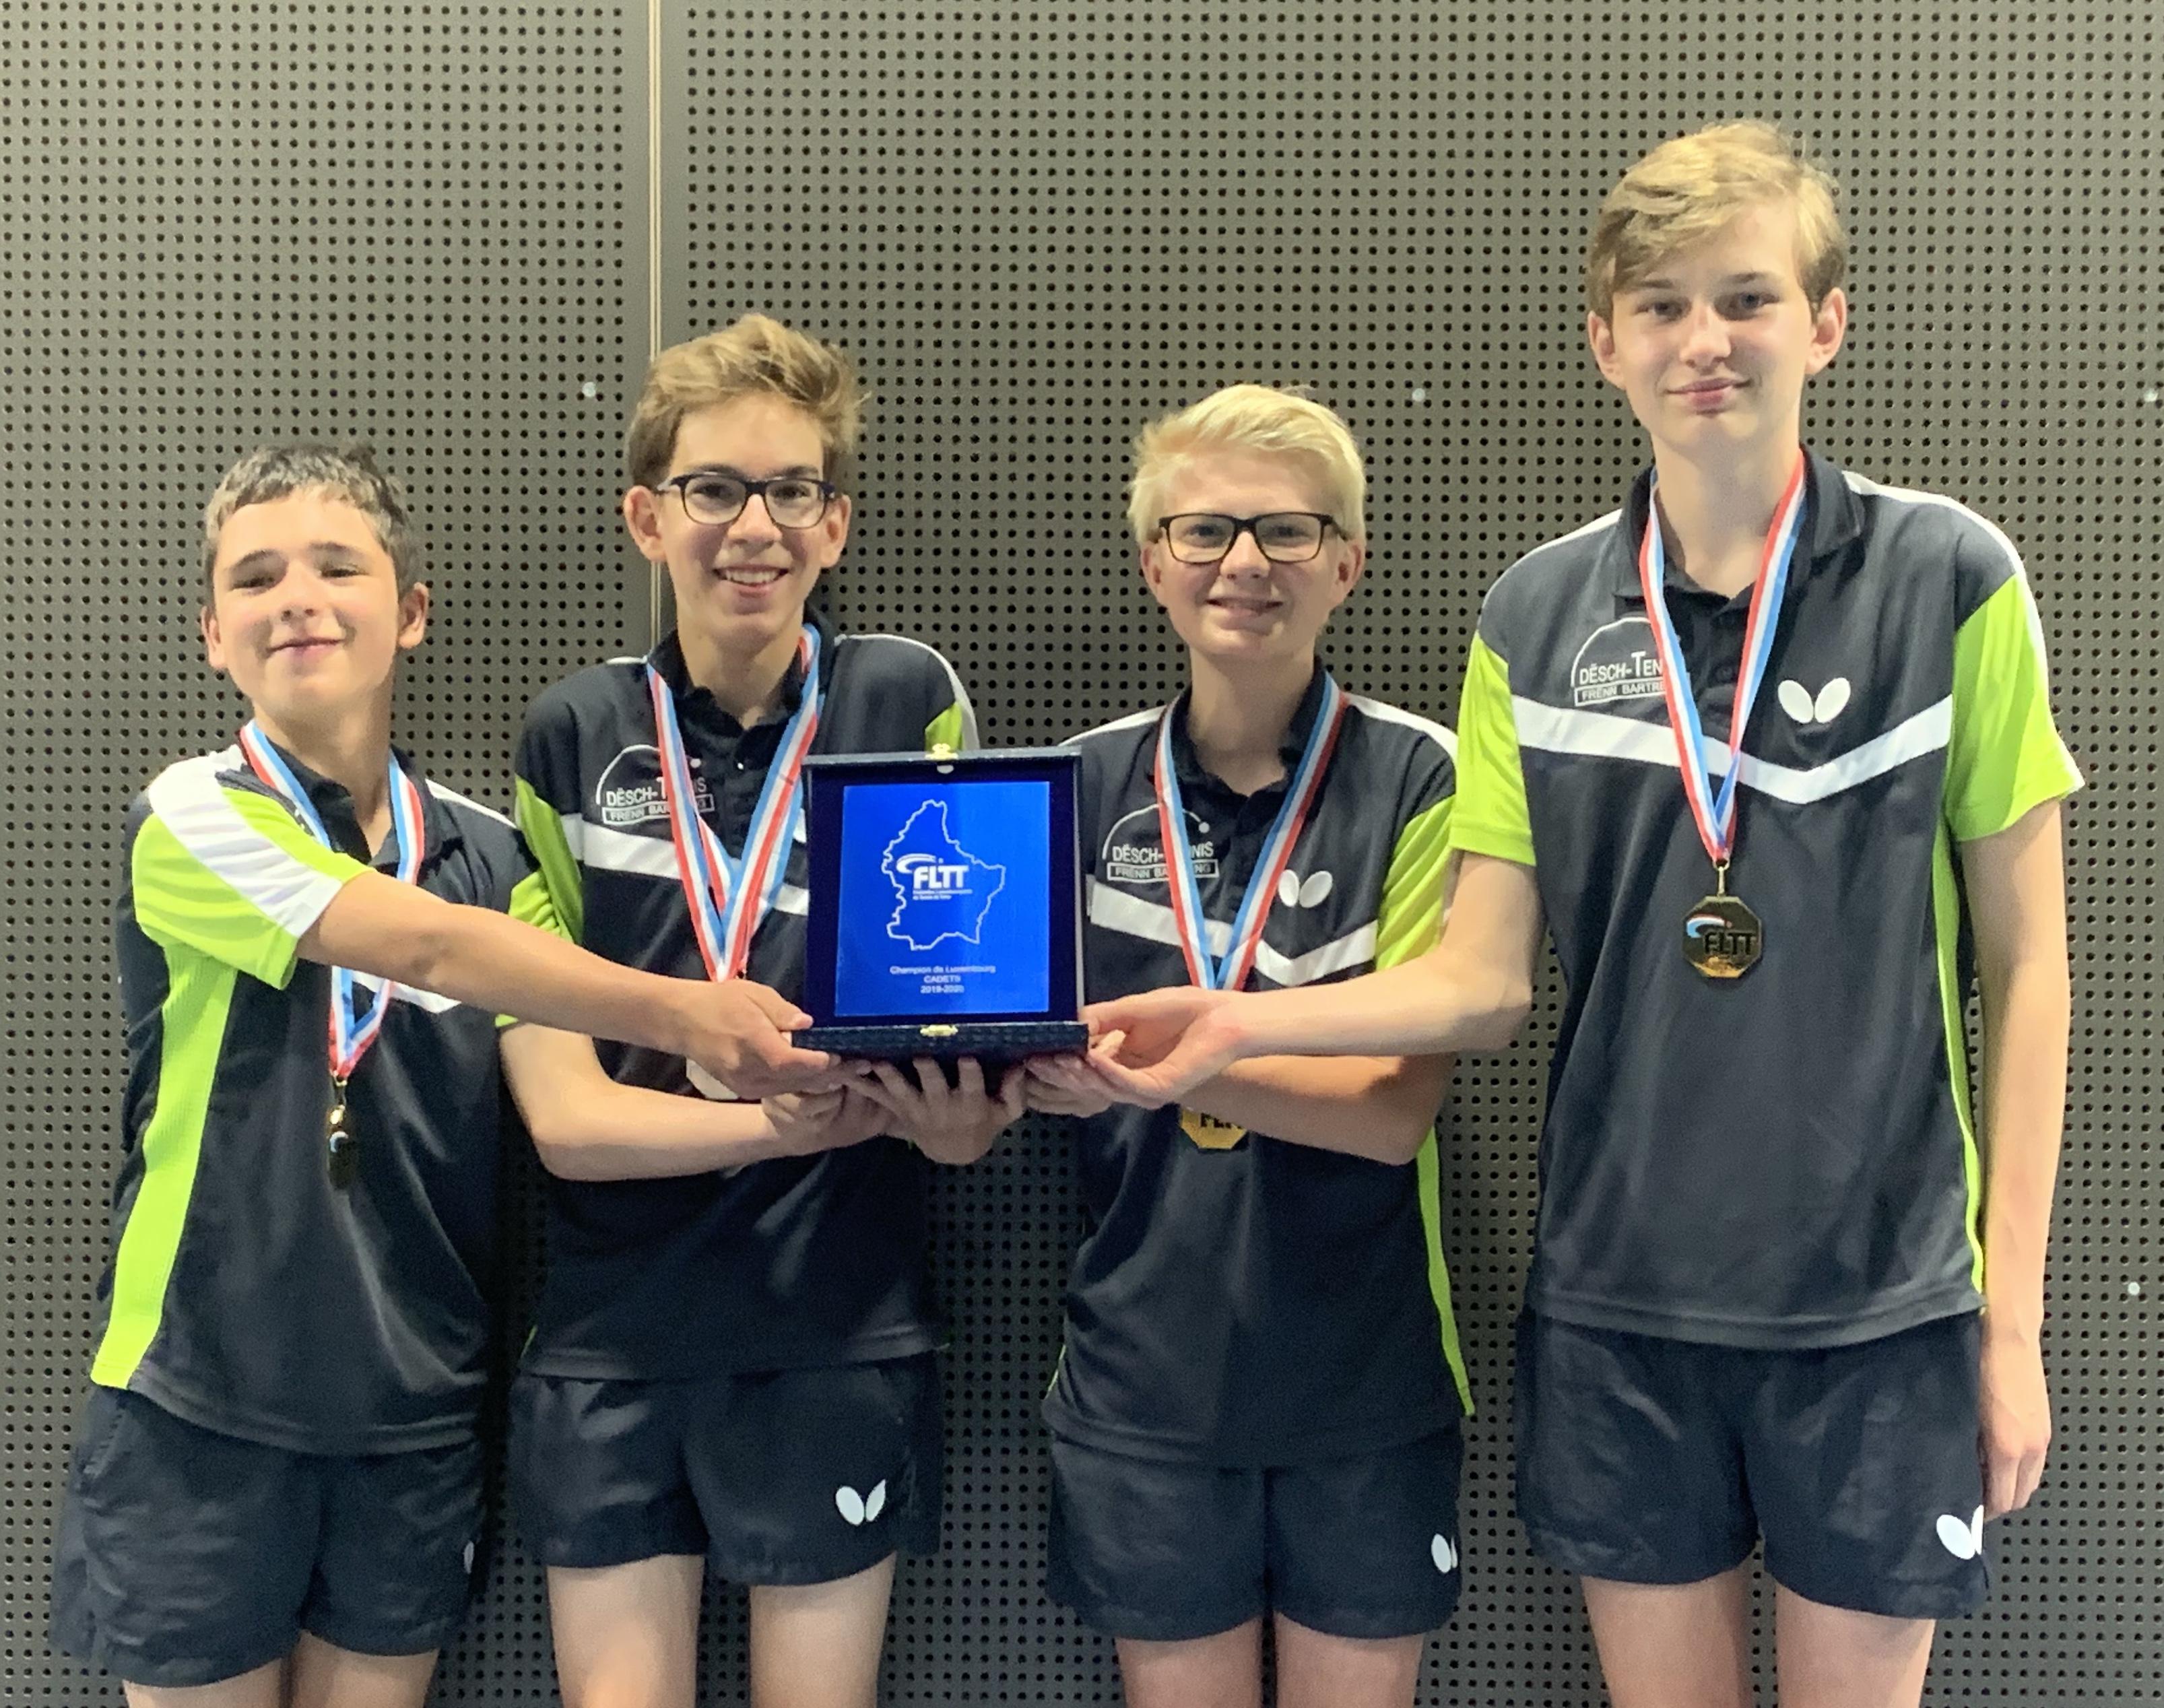 Cadets - Champion de Luxembourg 2019/2020